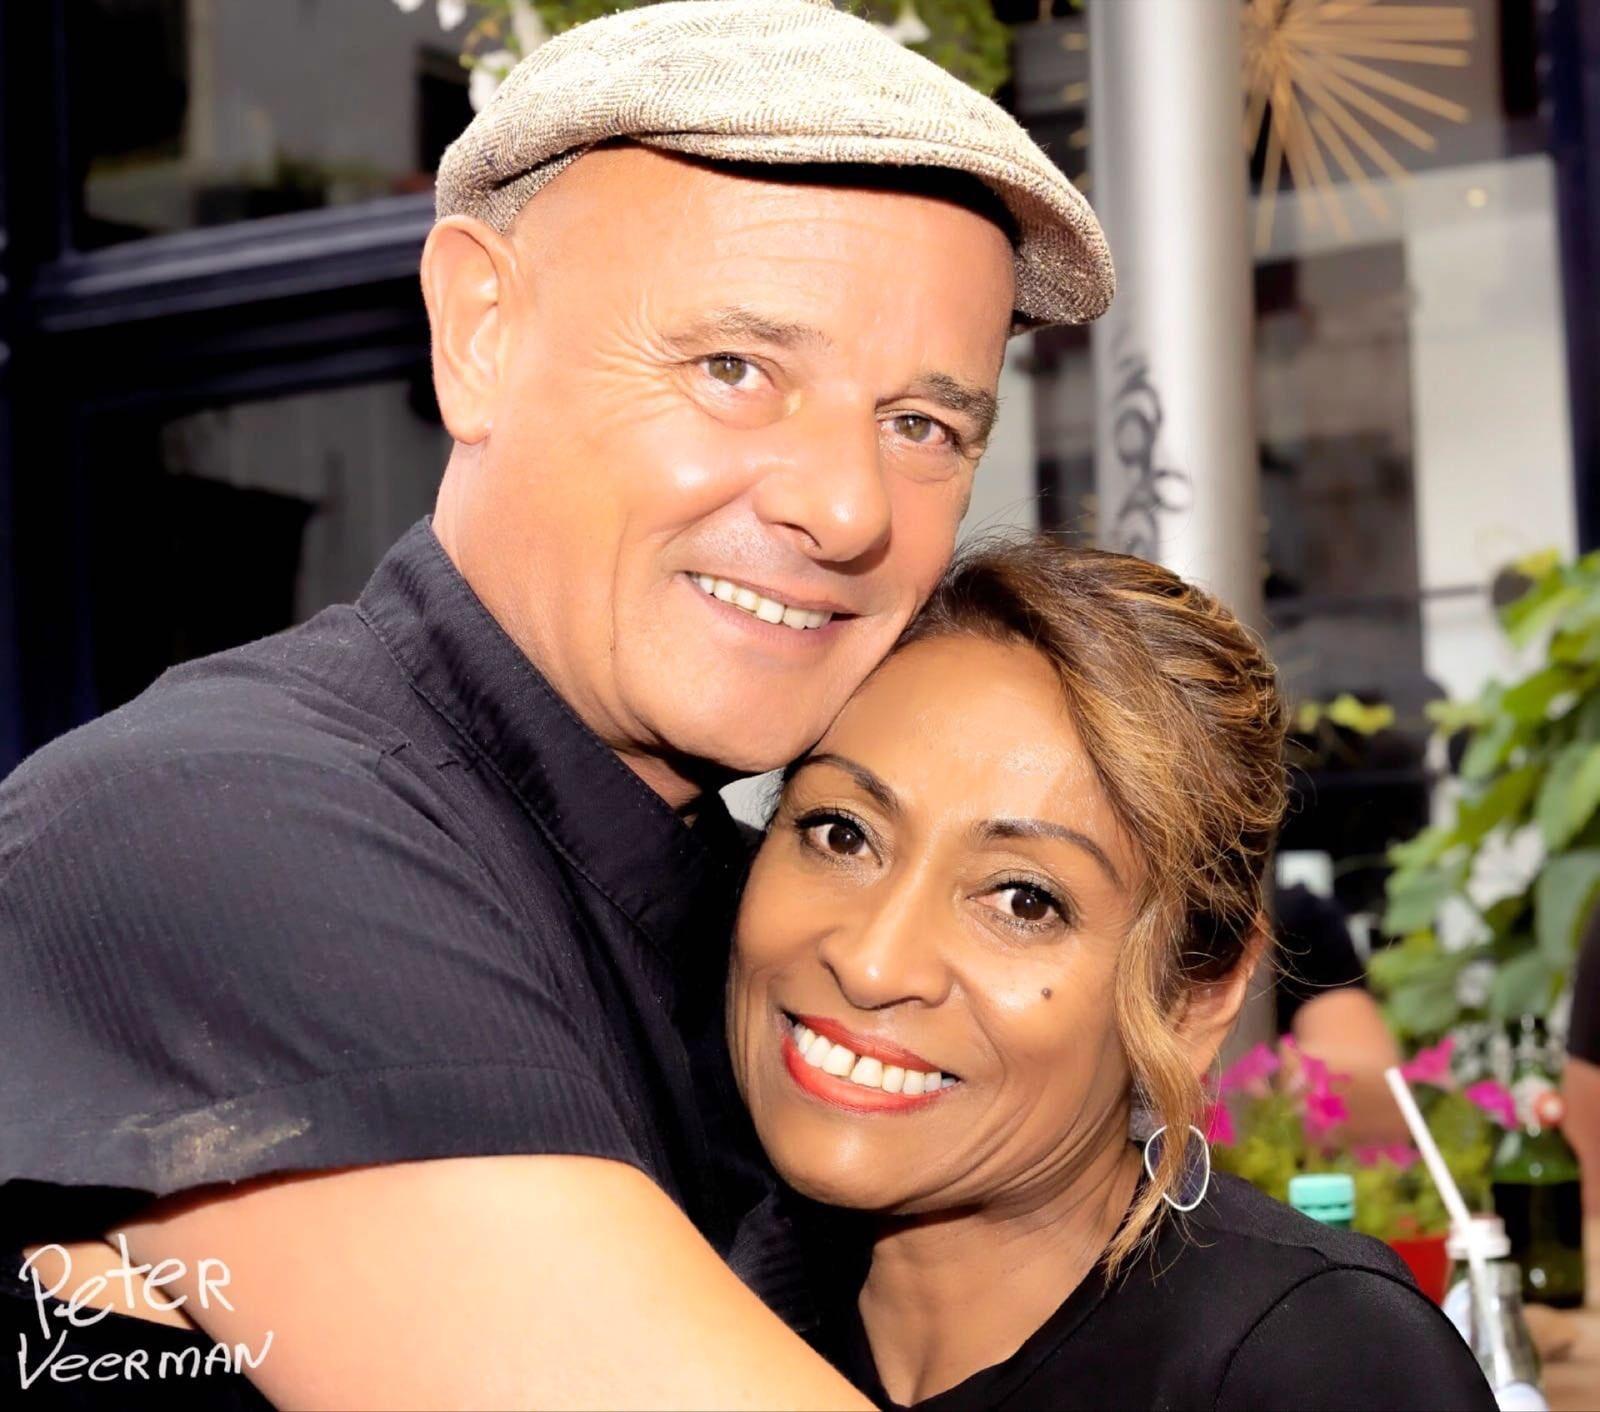 Jurgen en Silvia, foto Peter Veerman